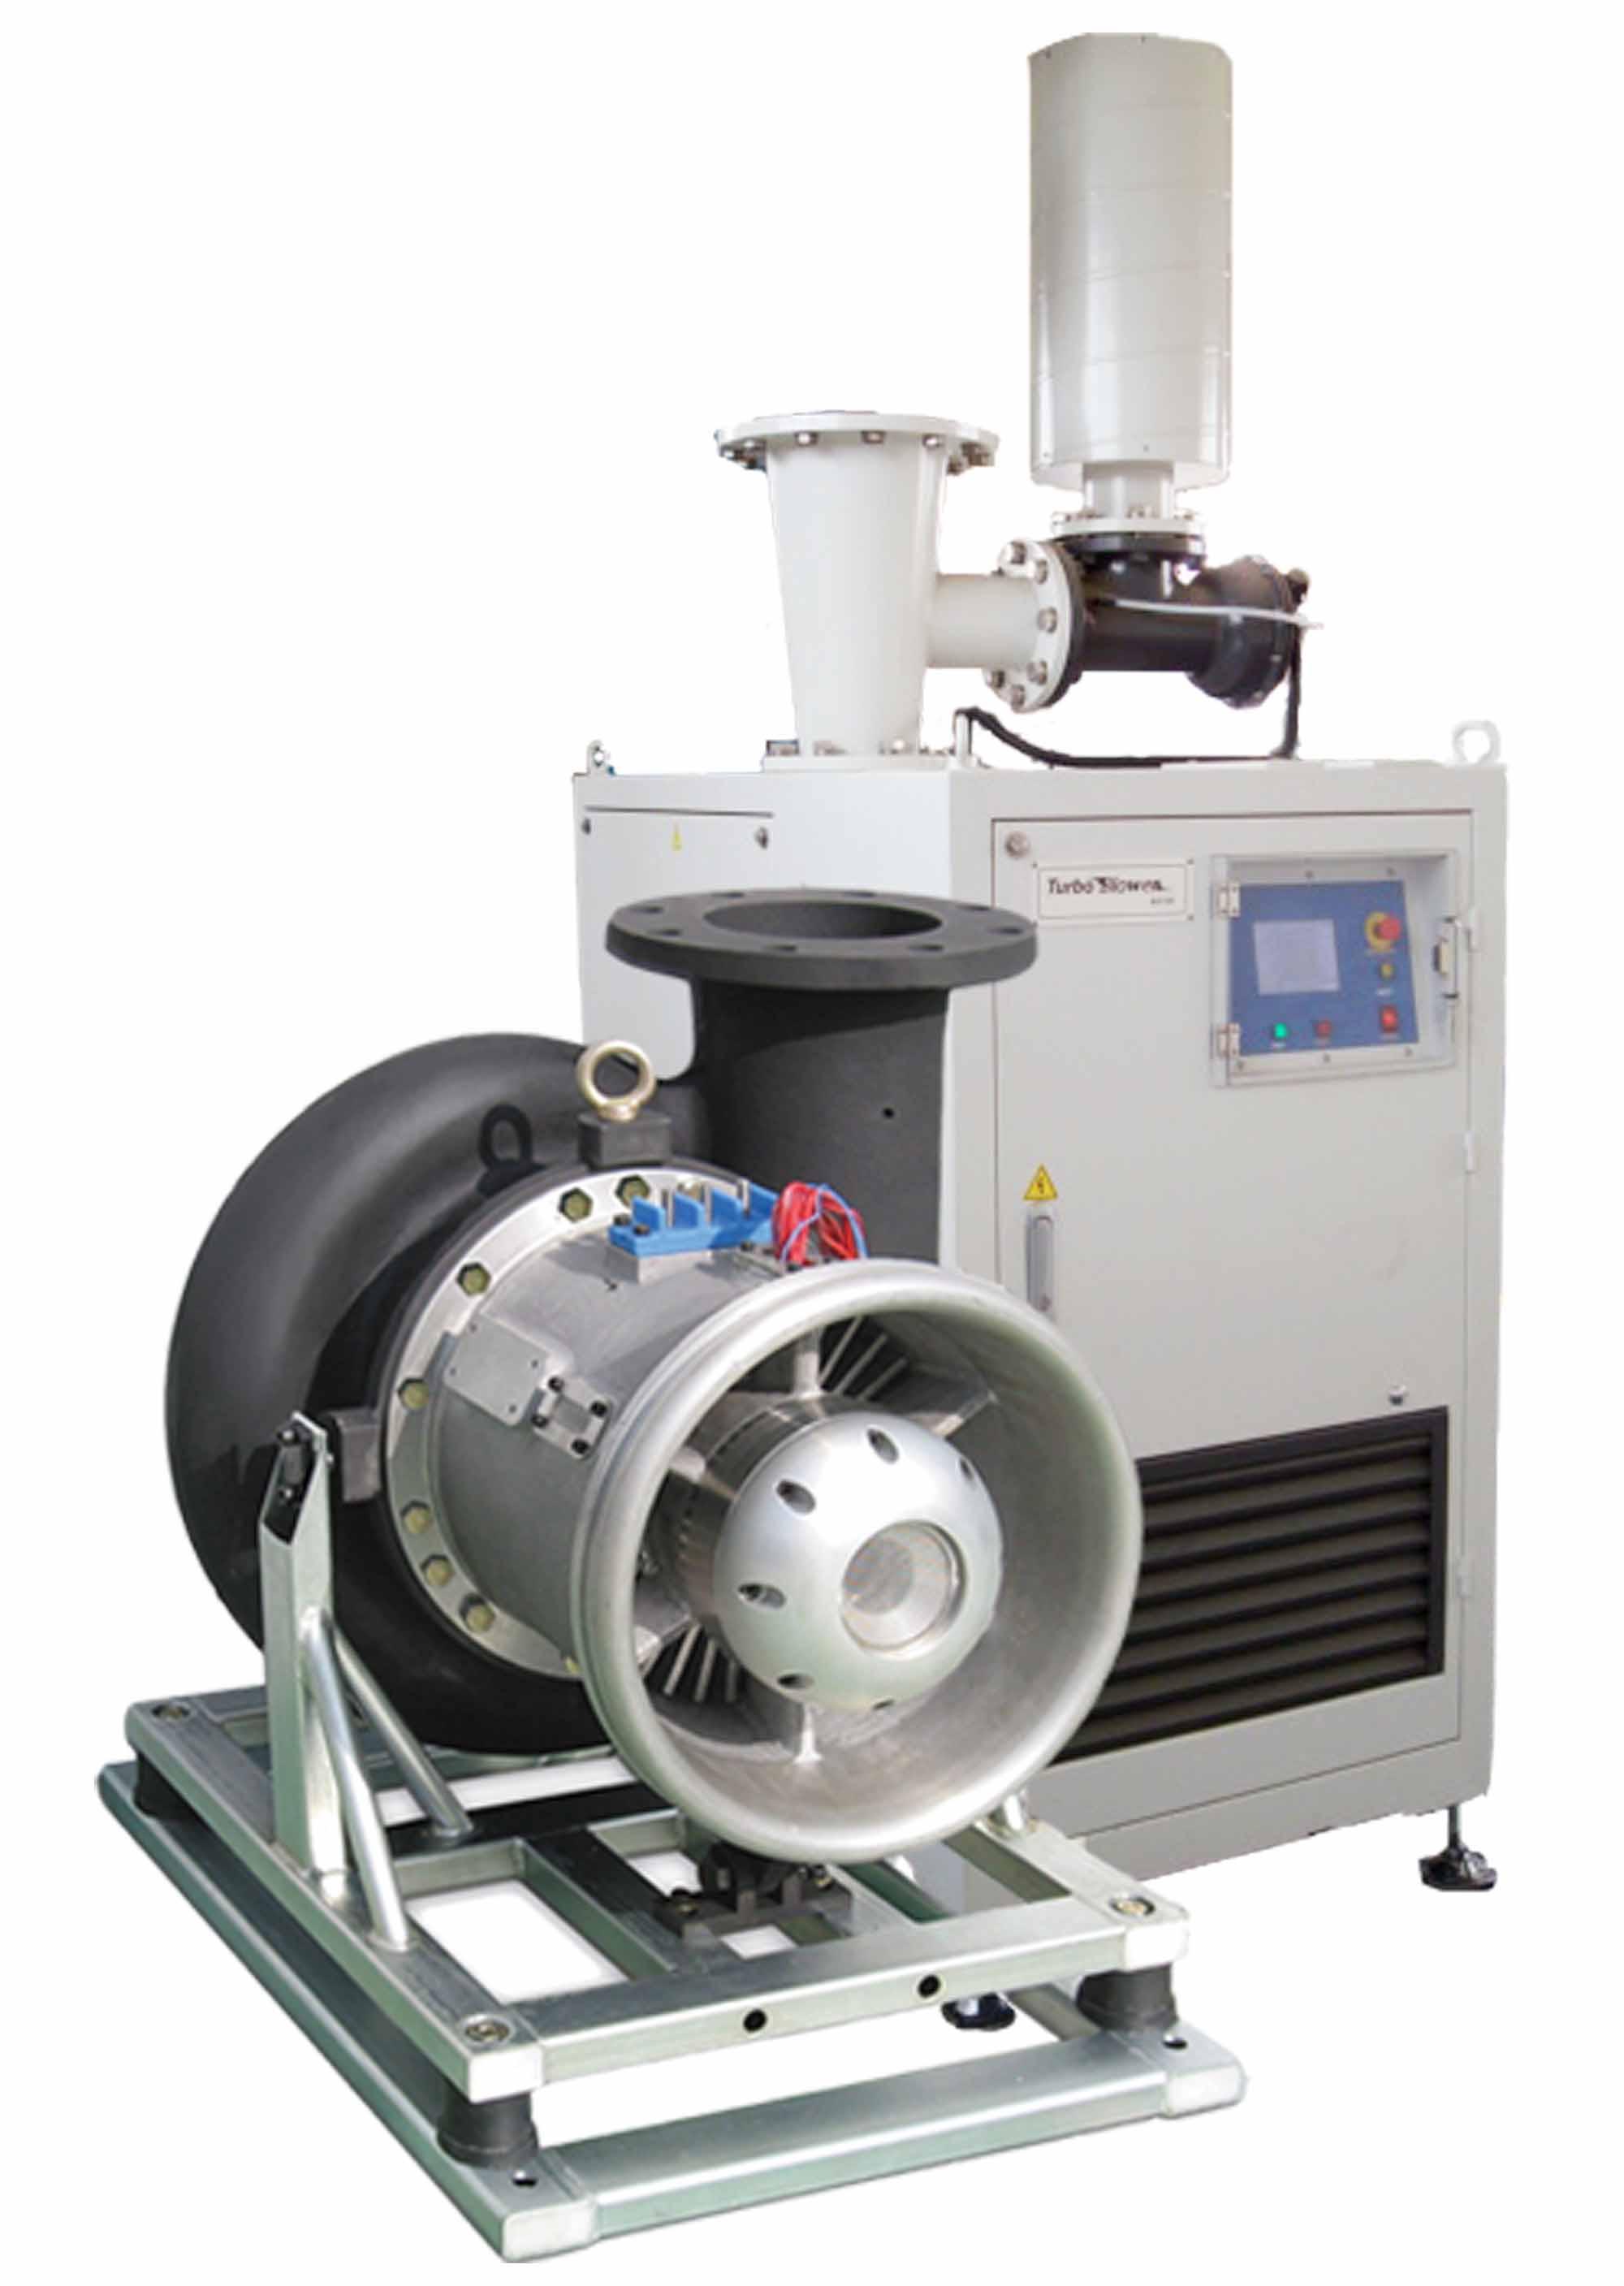 Apsco llc air and gas handling equipment for Air motors and drives llc